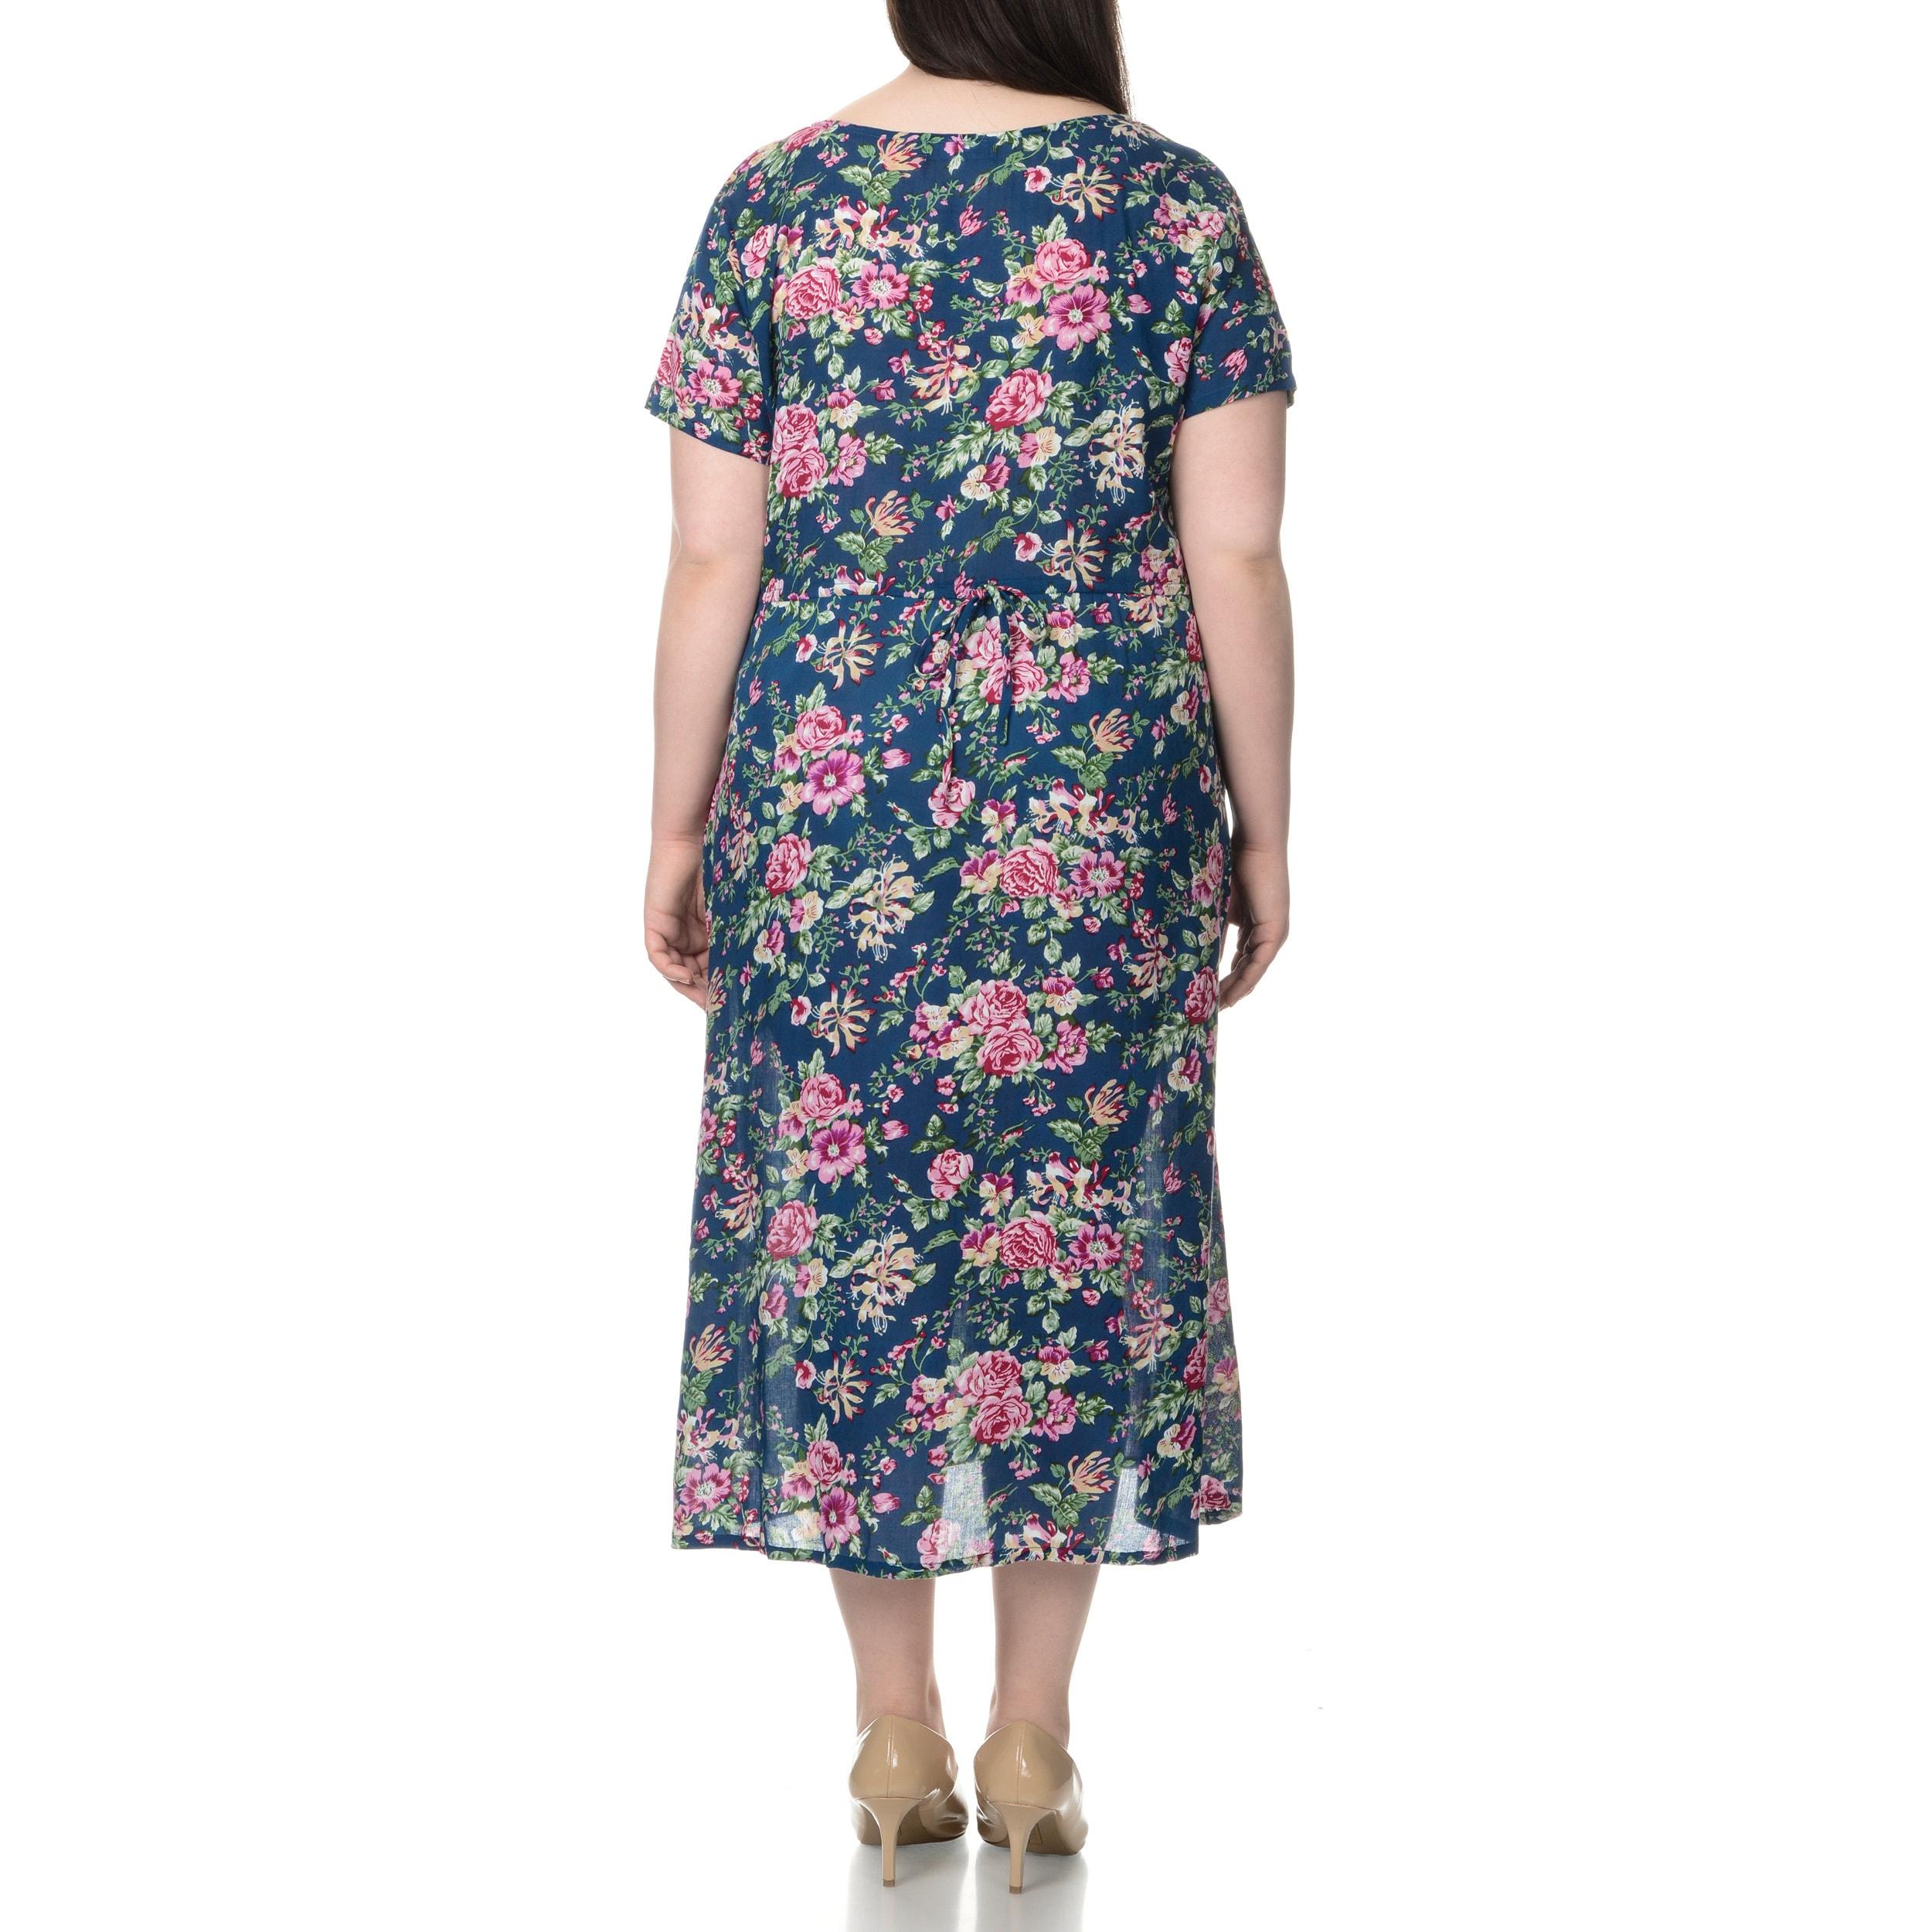 La Cera Womens Plus Size Floral Pint Short Sleeve Casual House